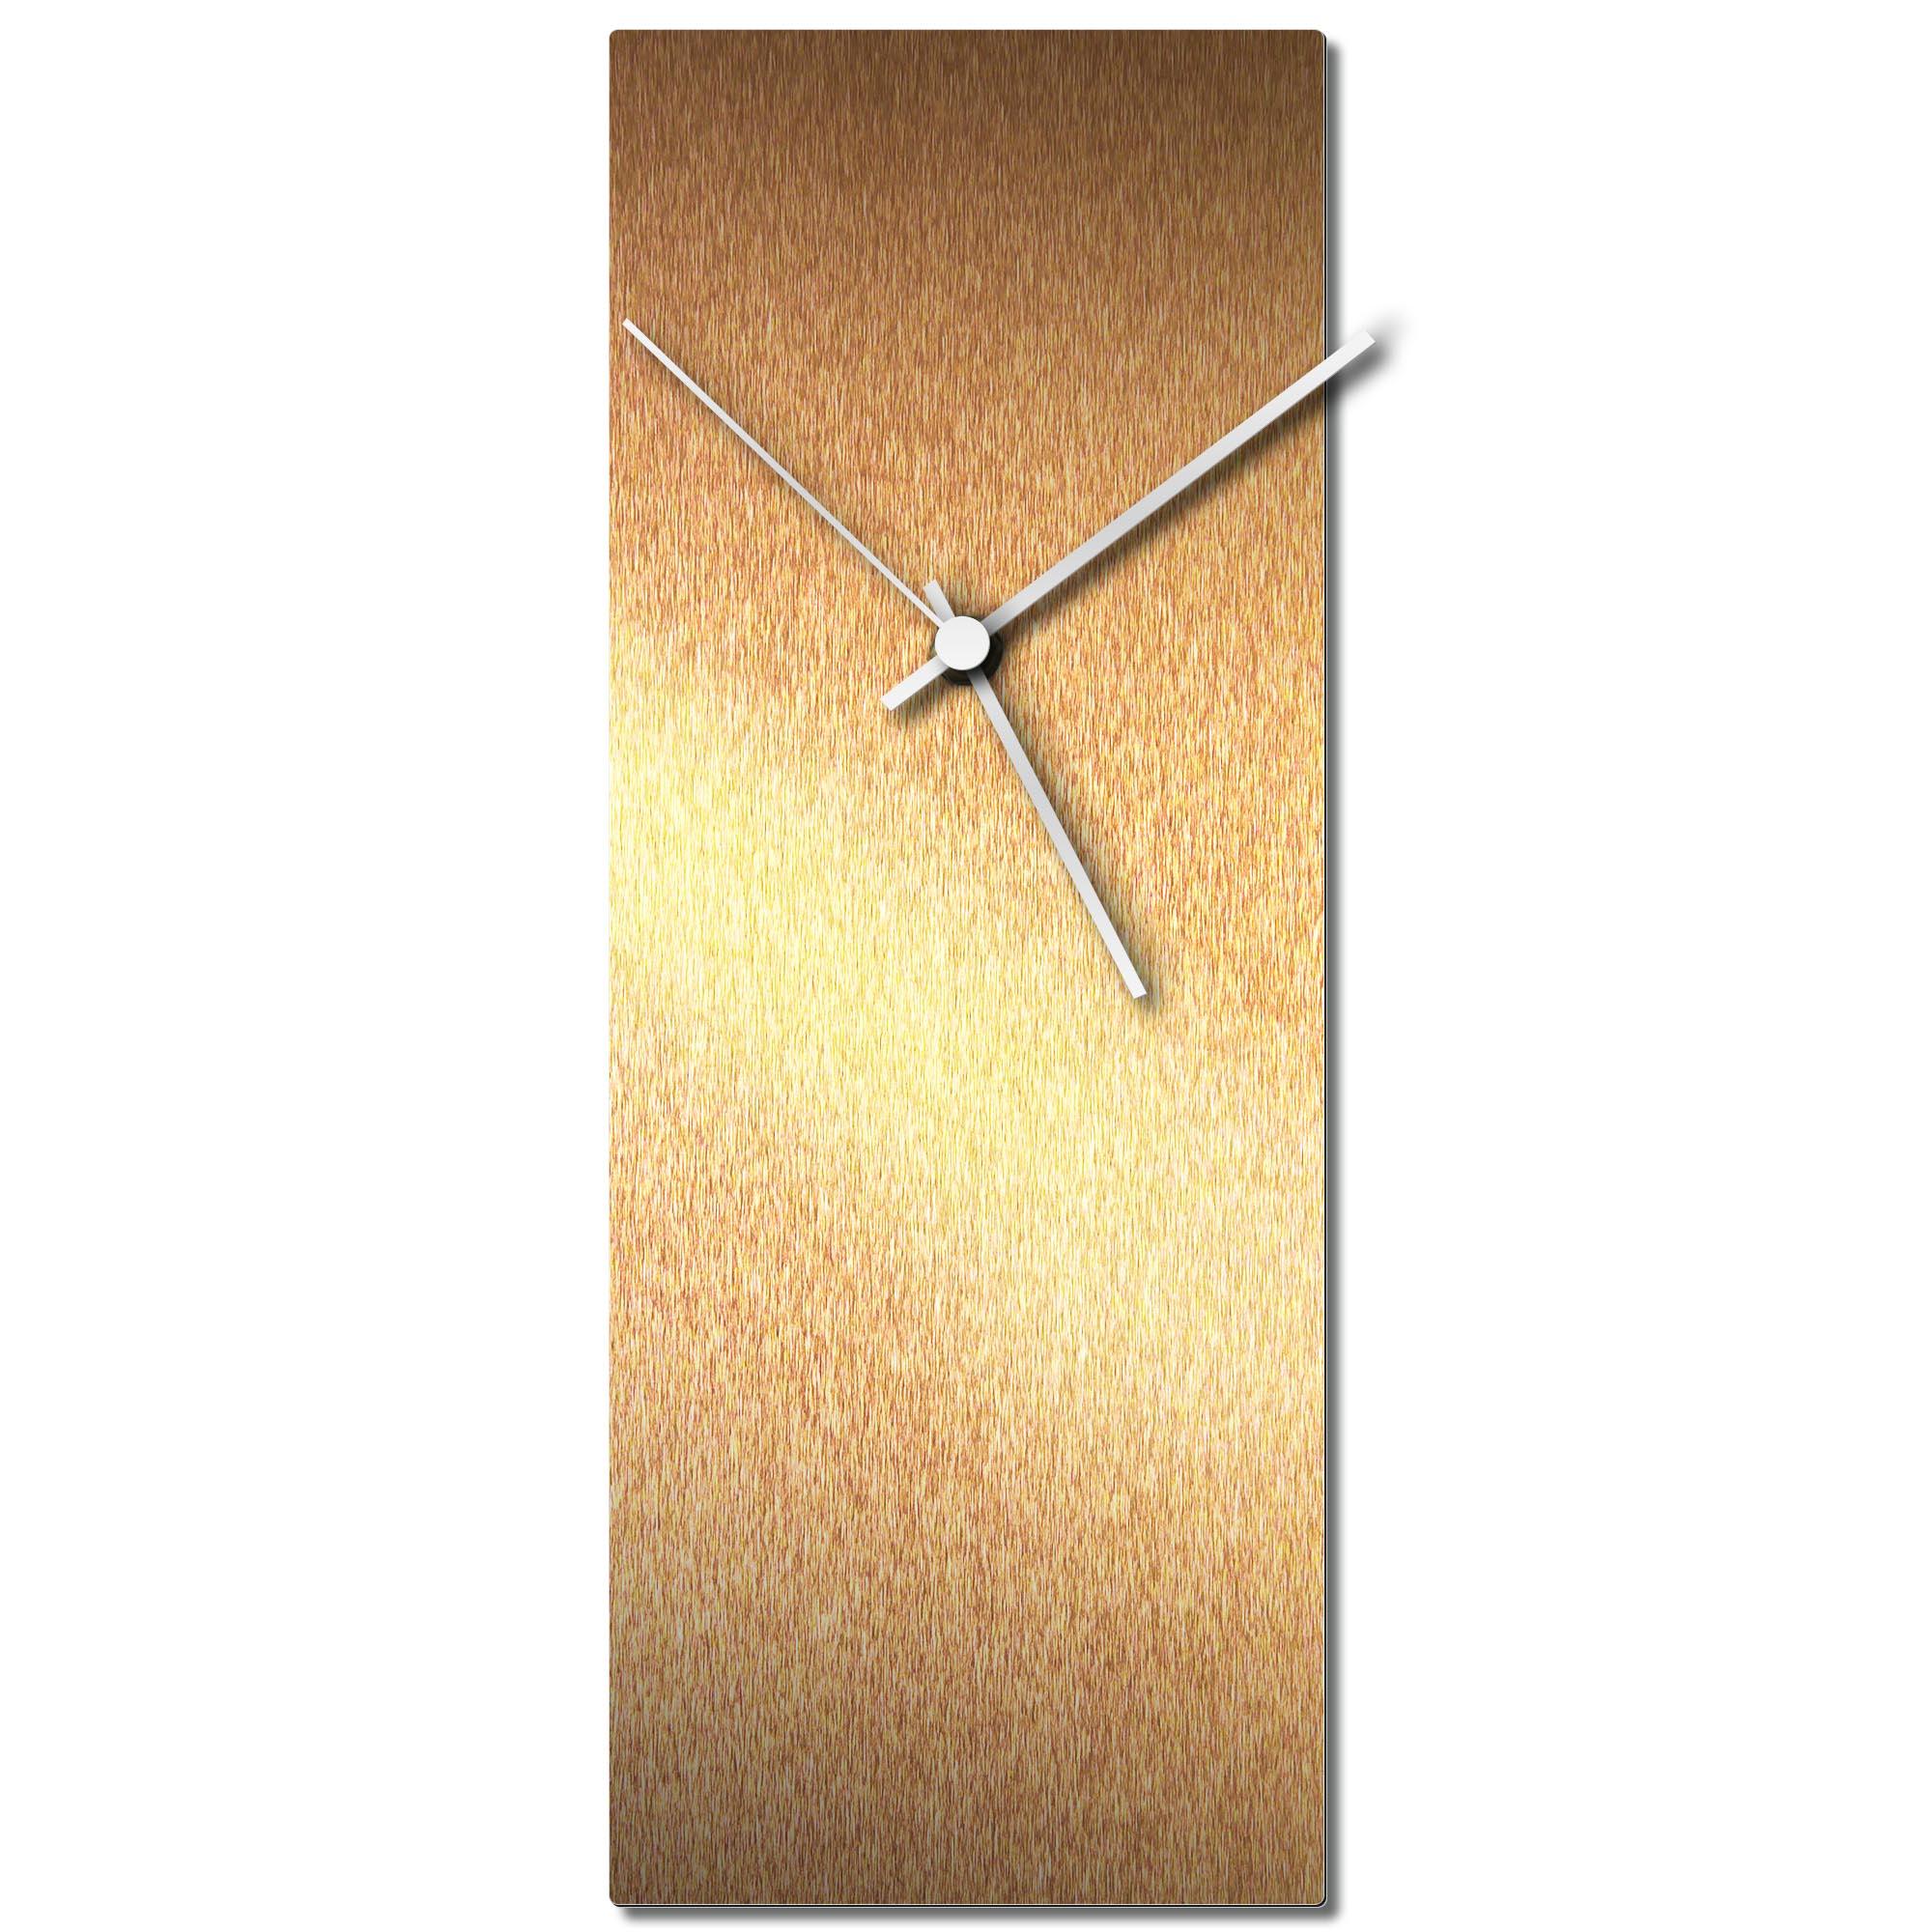 Adam Schwoeppe 'Bronzesmith Clock Large White' Midcentury Modern Style Wall Clock